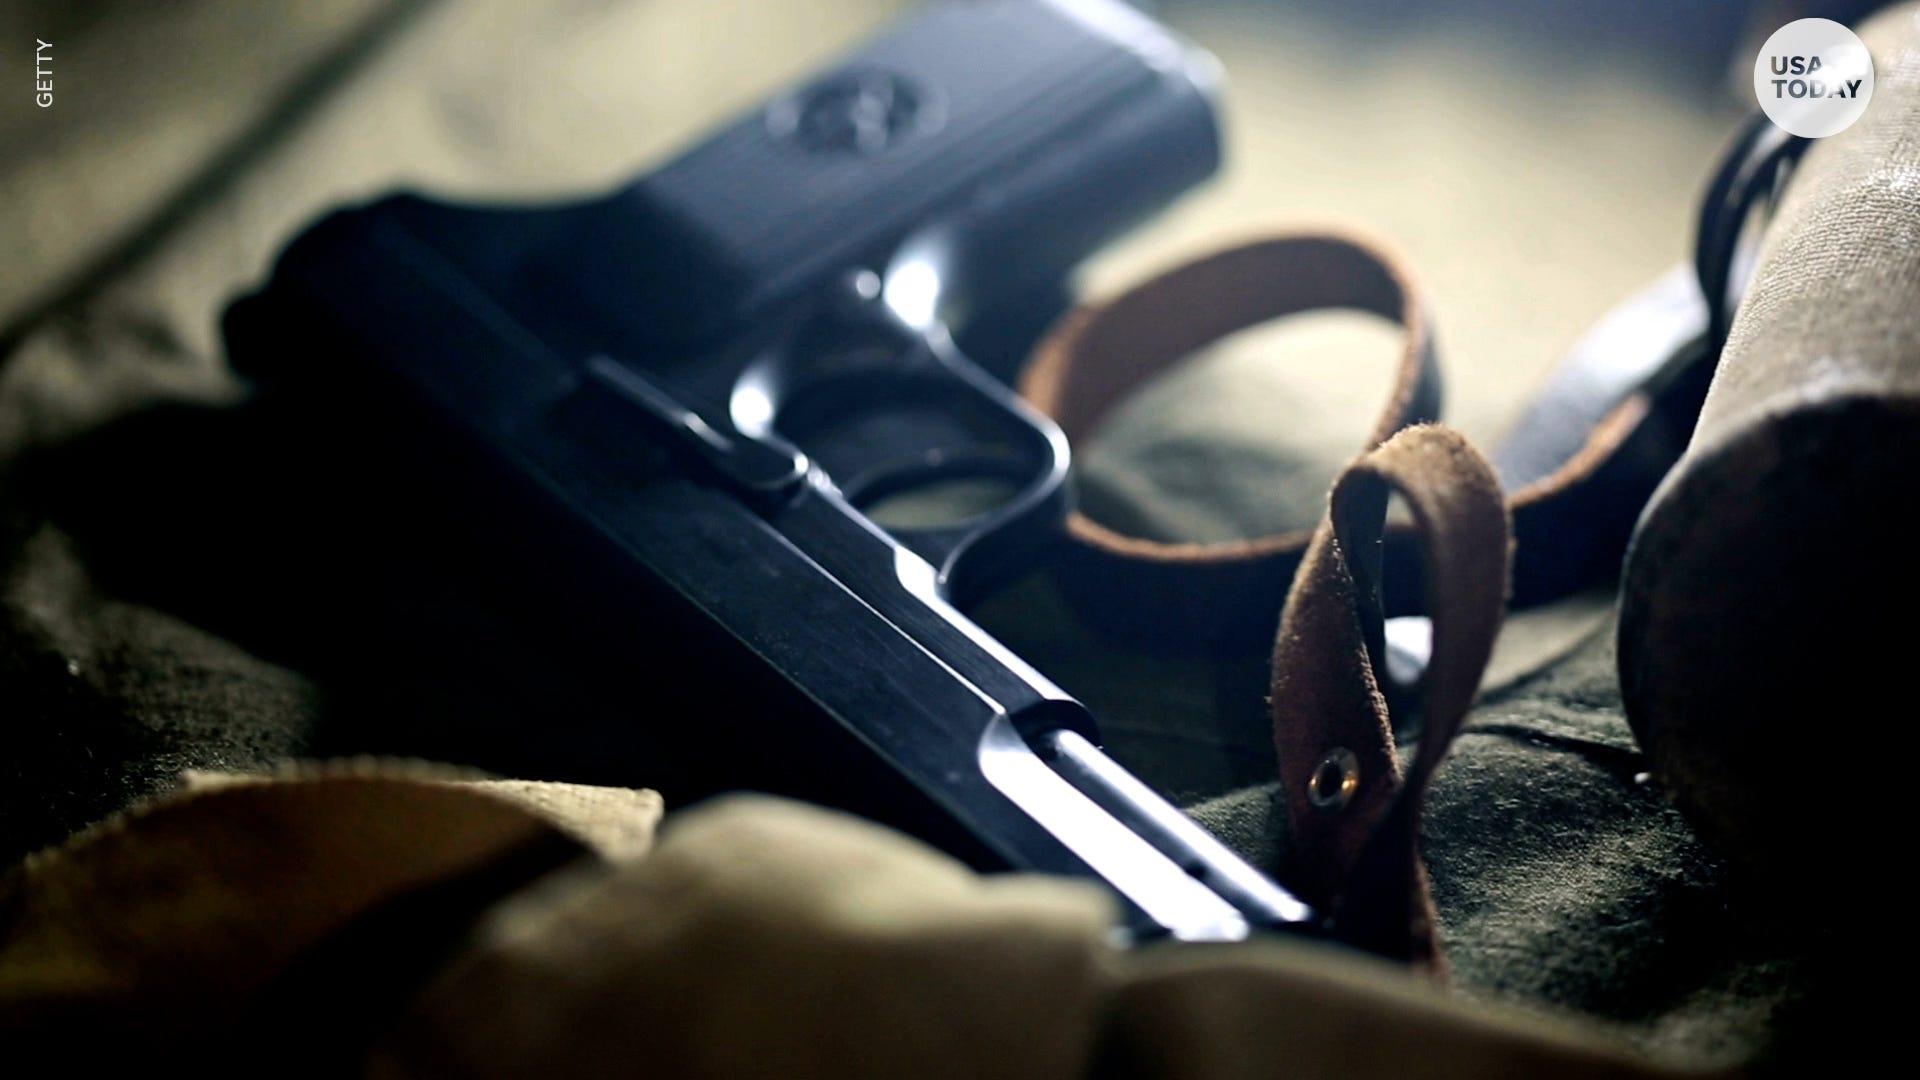 Film veterans explain safety protocols for prop guns on set